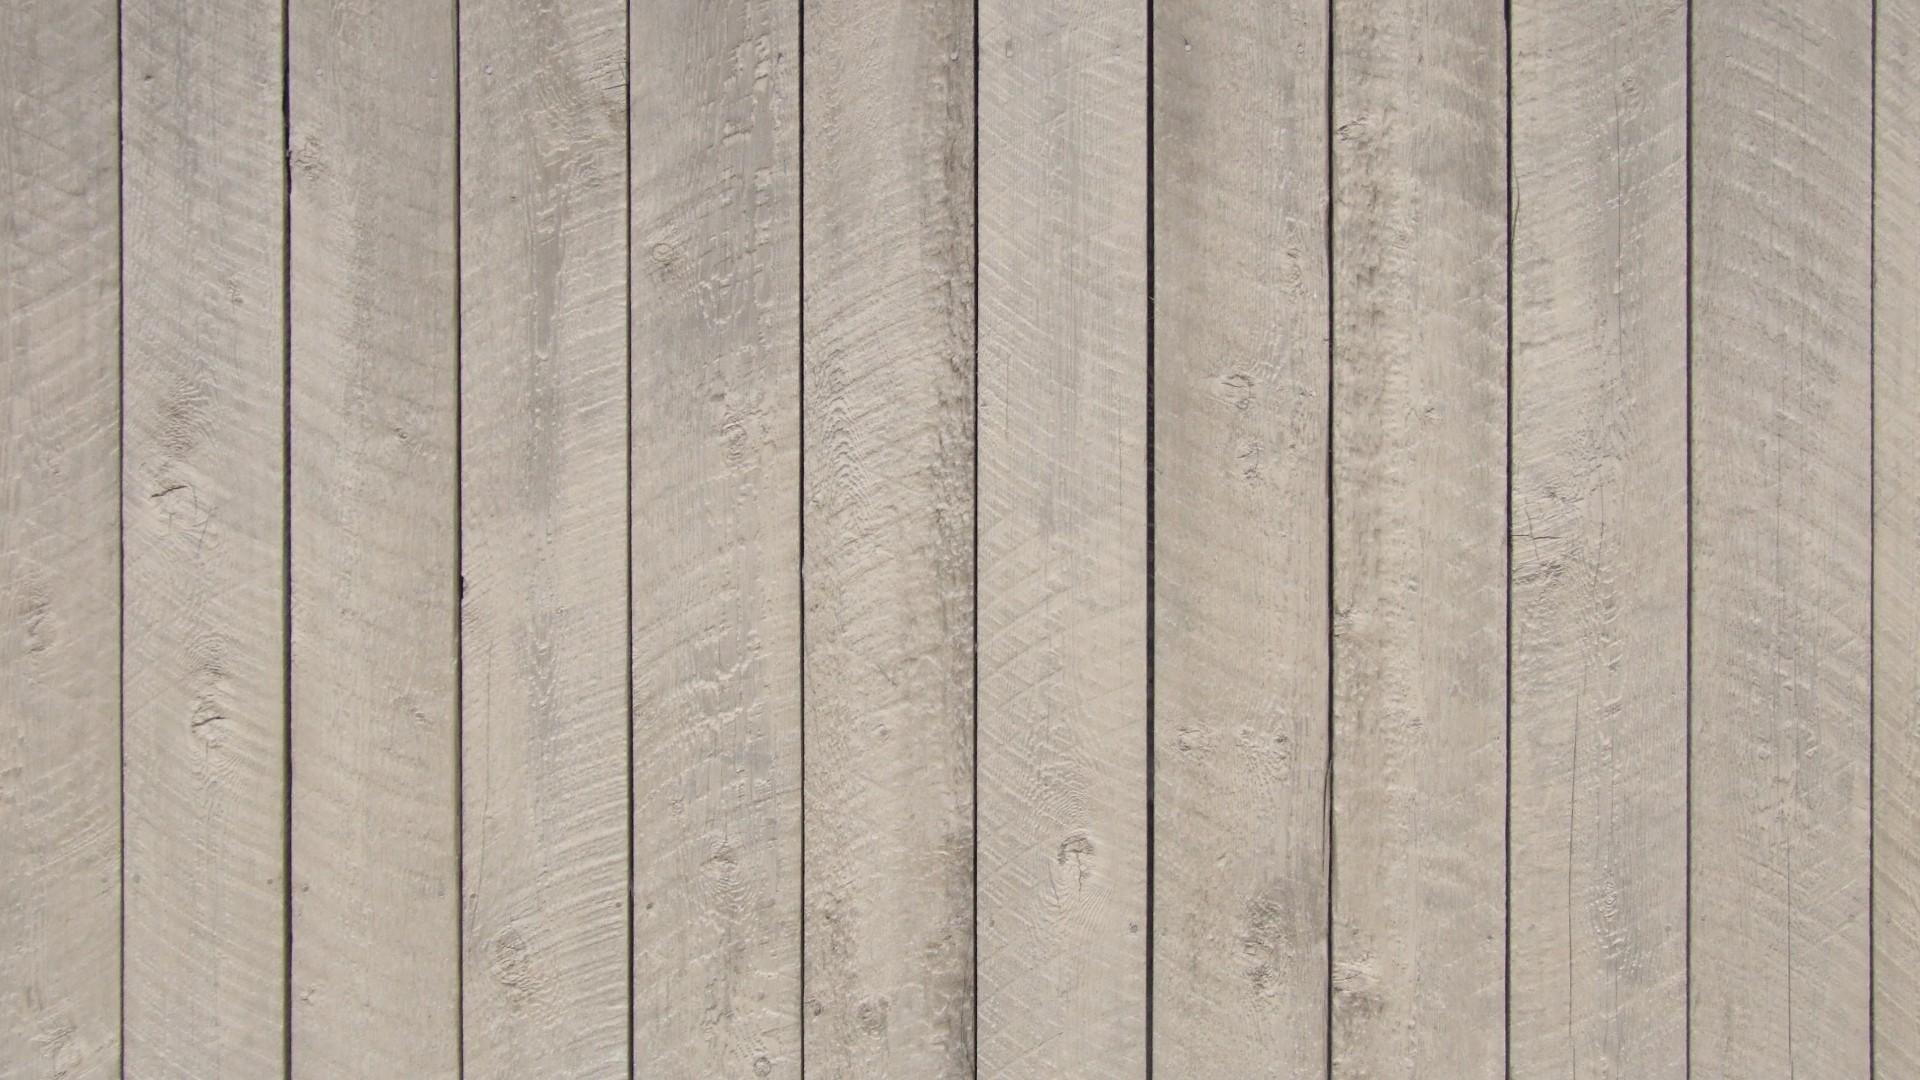 White Wood wallpaper photo hd